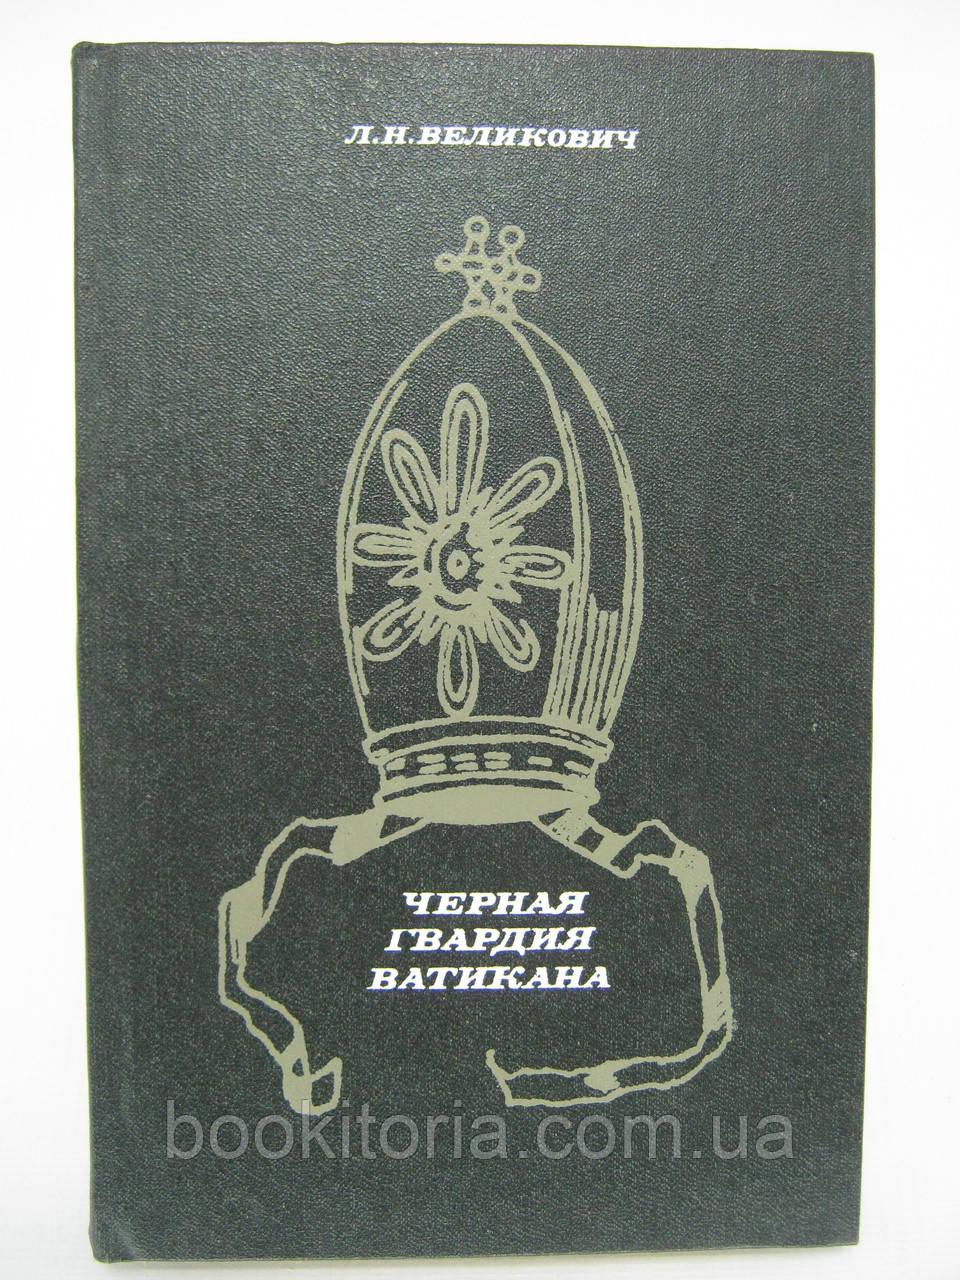 Великович Л.Н. Черная гвардия Ватикана (б/у).